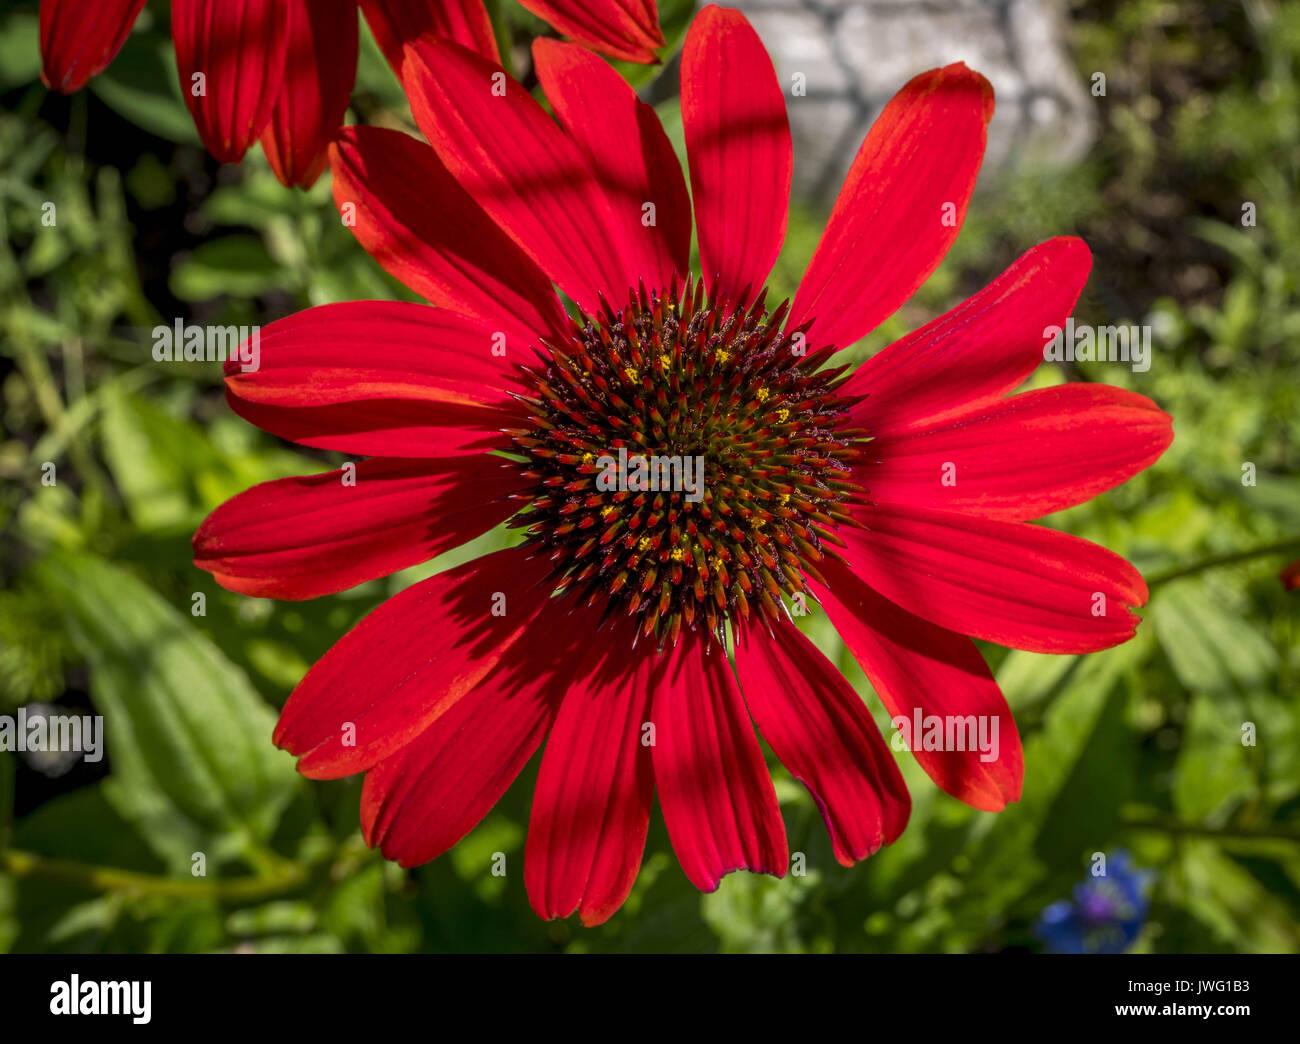 Rote Rudbeckie, Roter Sonnenhut oder Purpur-Sonnenhut (Echinacea purpurea), Bayern, Deutschland, Europa - Stock Image